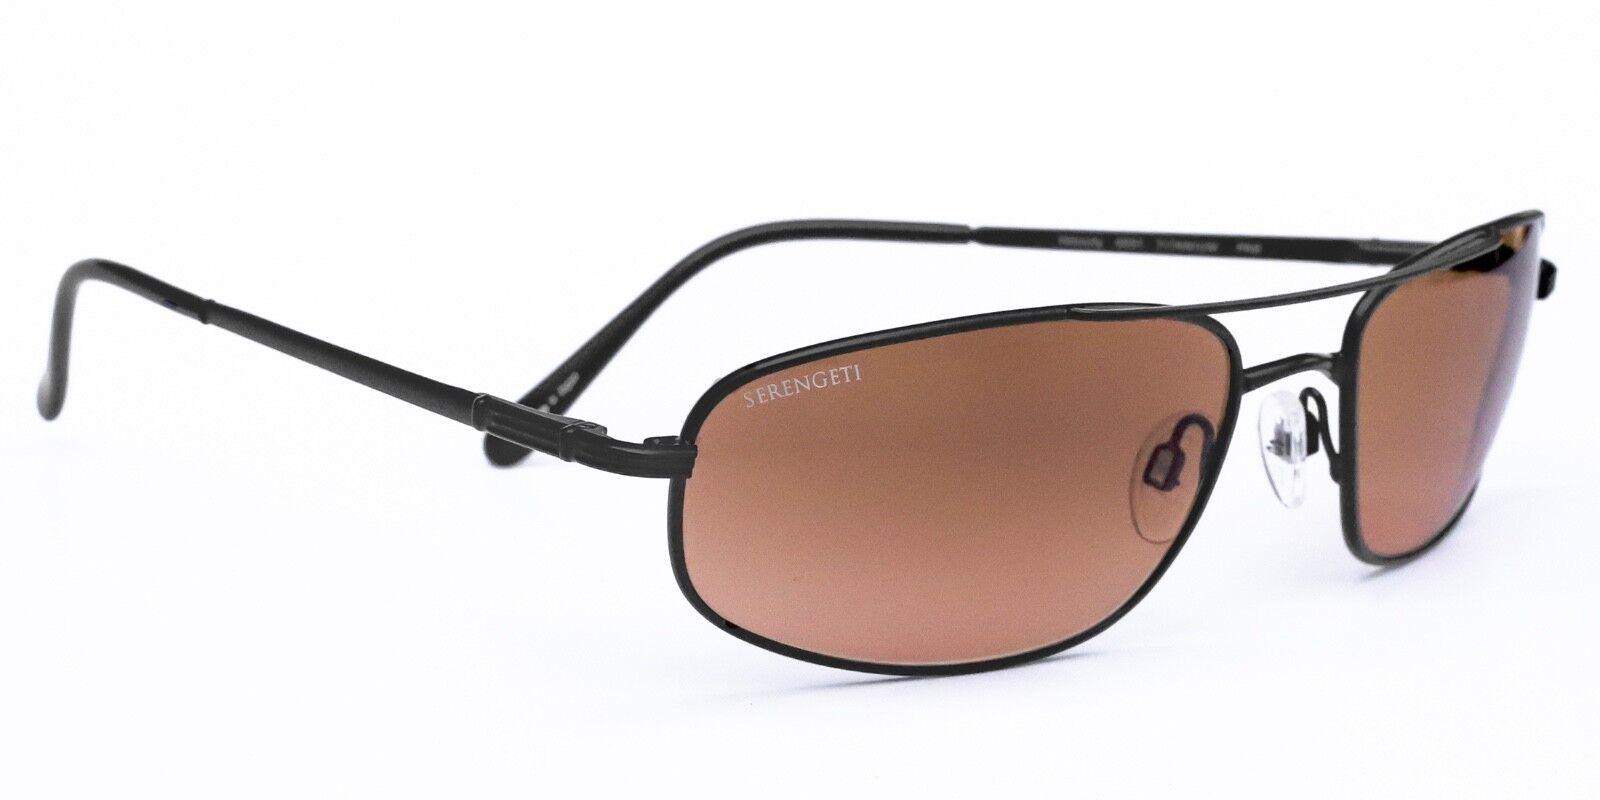 1cf003aa608f Serengeti Sunglasses Velocity Matte Black Drivers Gradient 6691 for ...